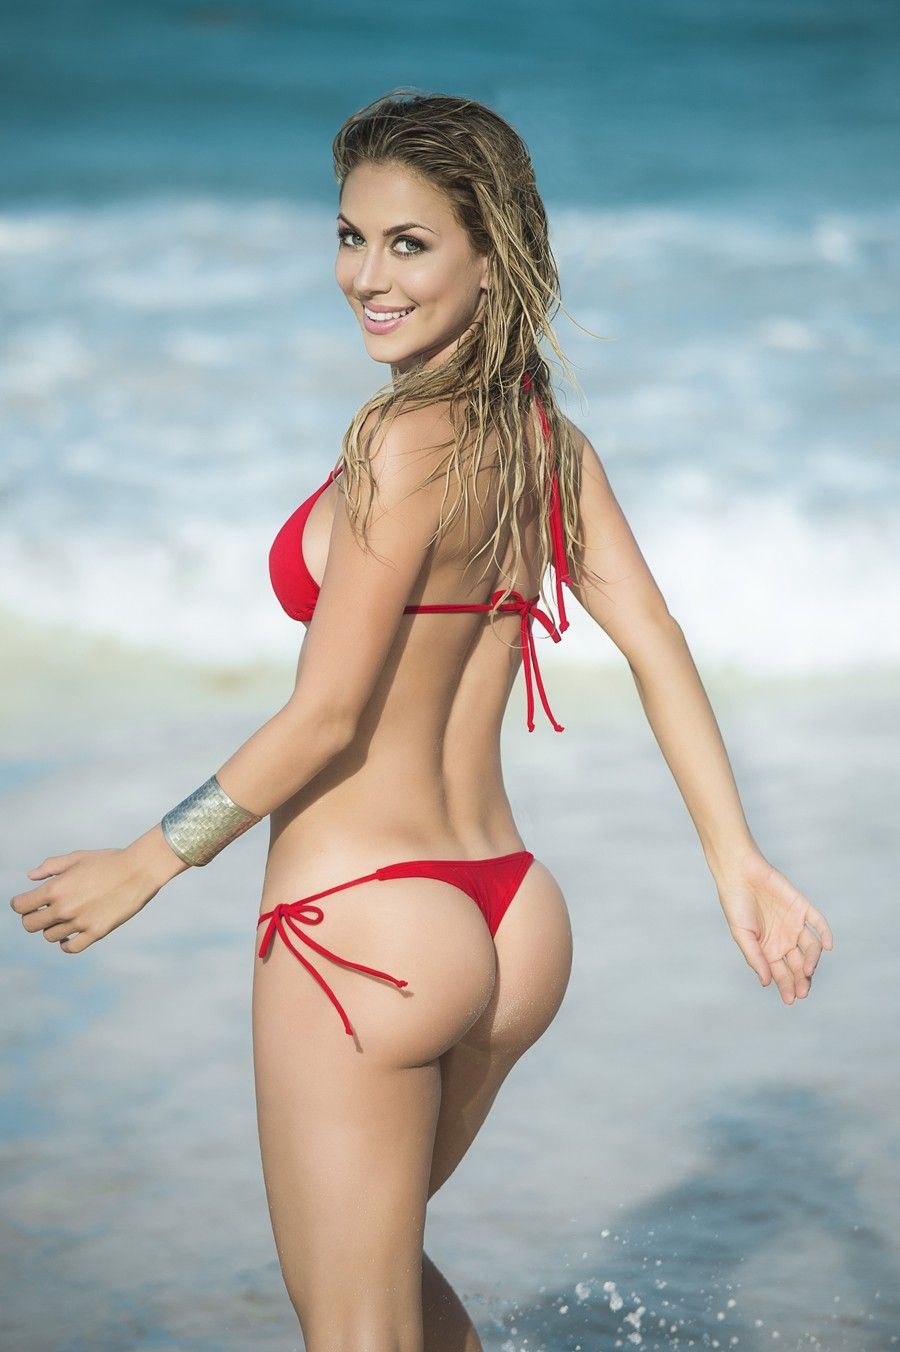 bikini dare